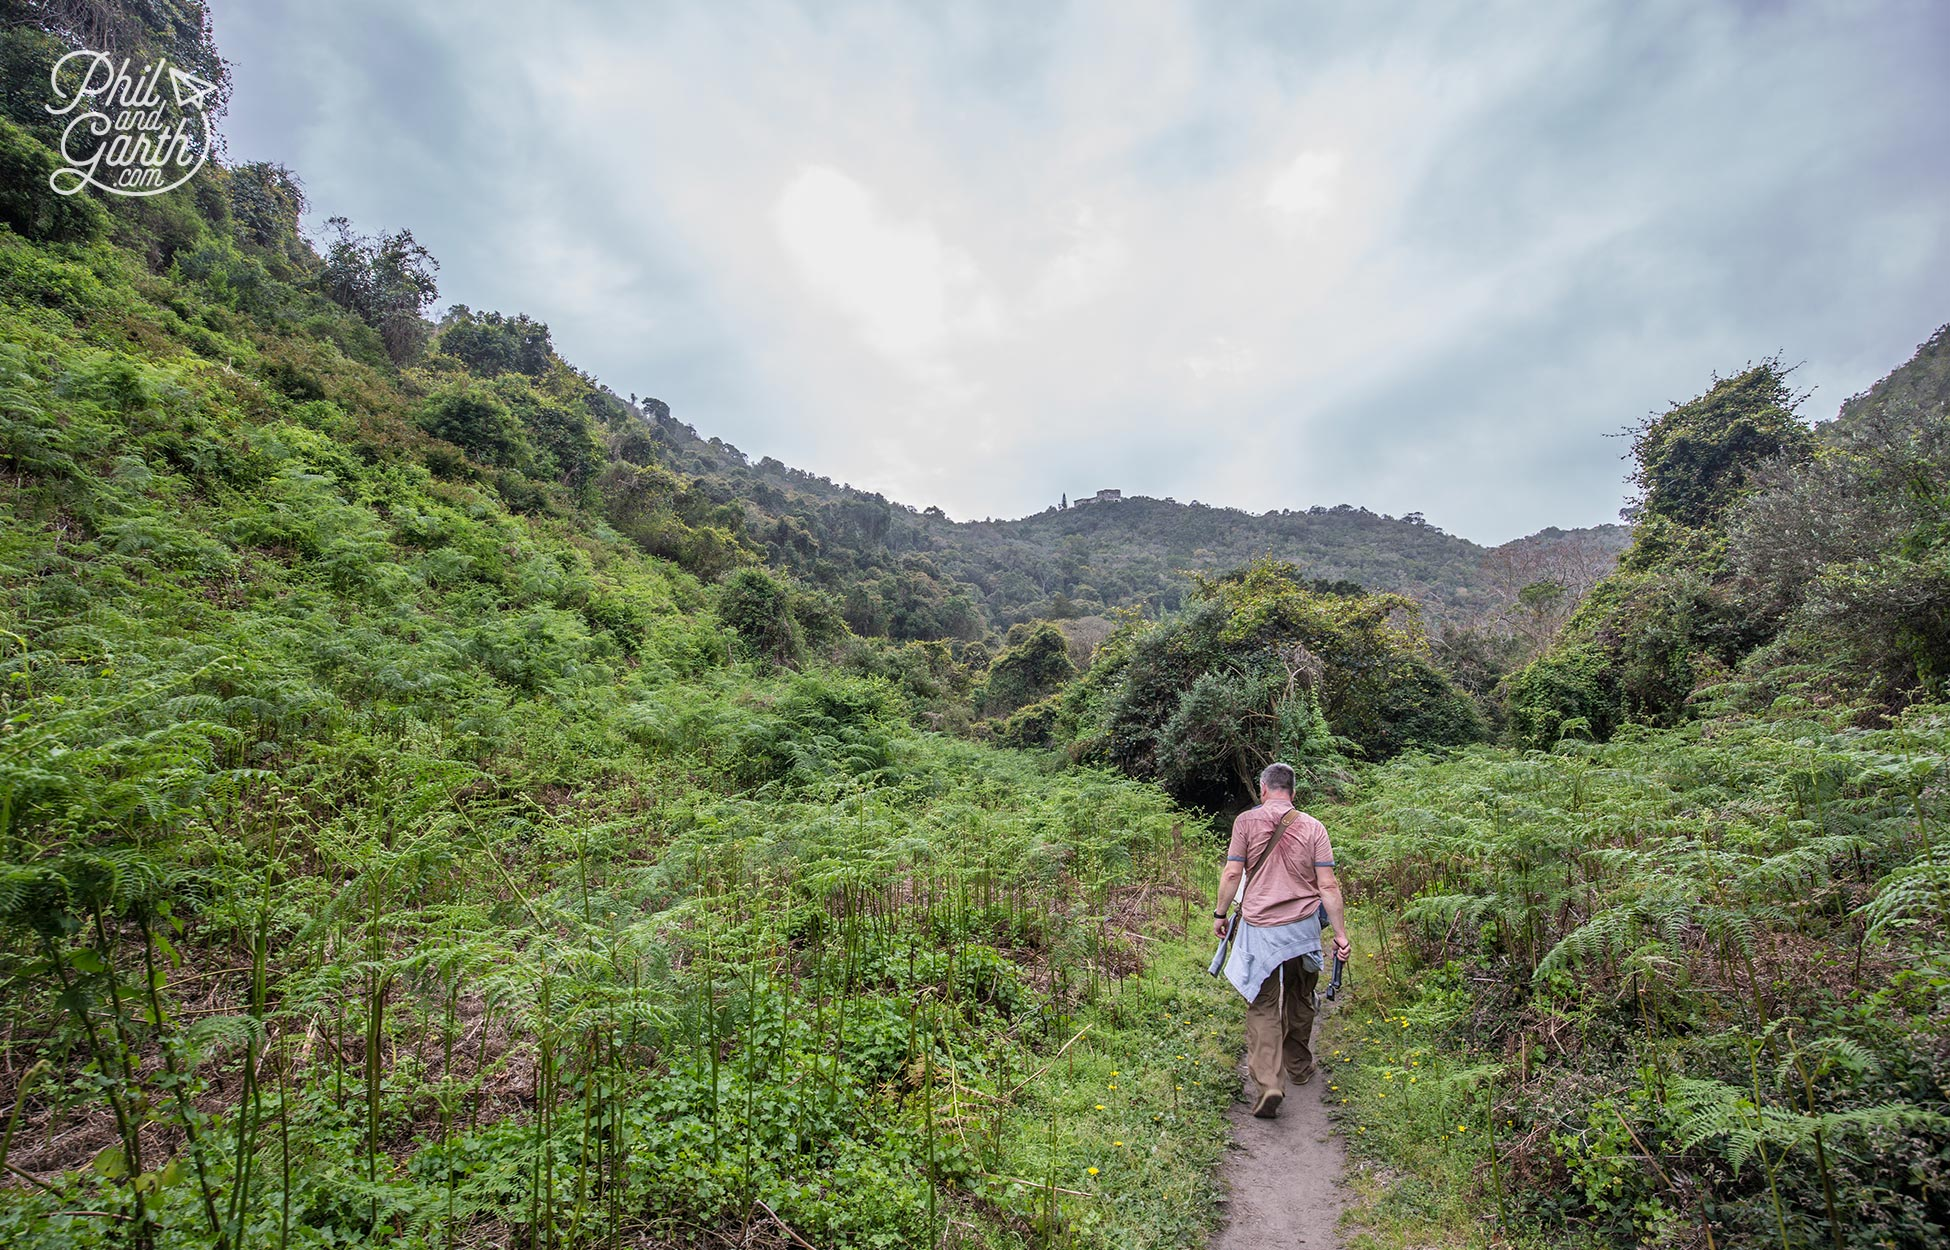 Phil walking through a fern lined path